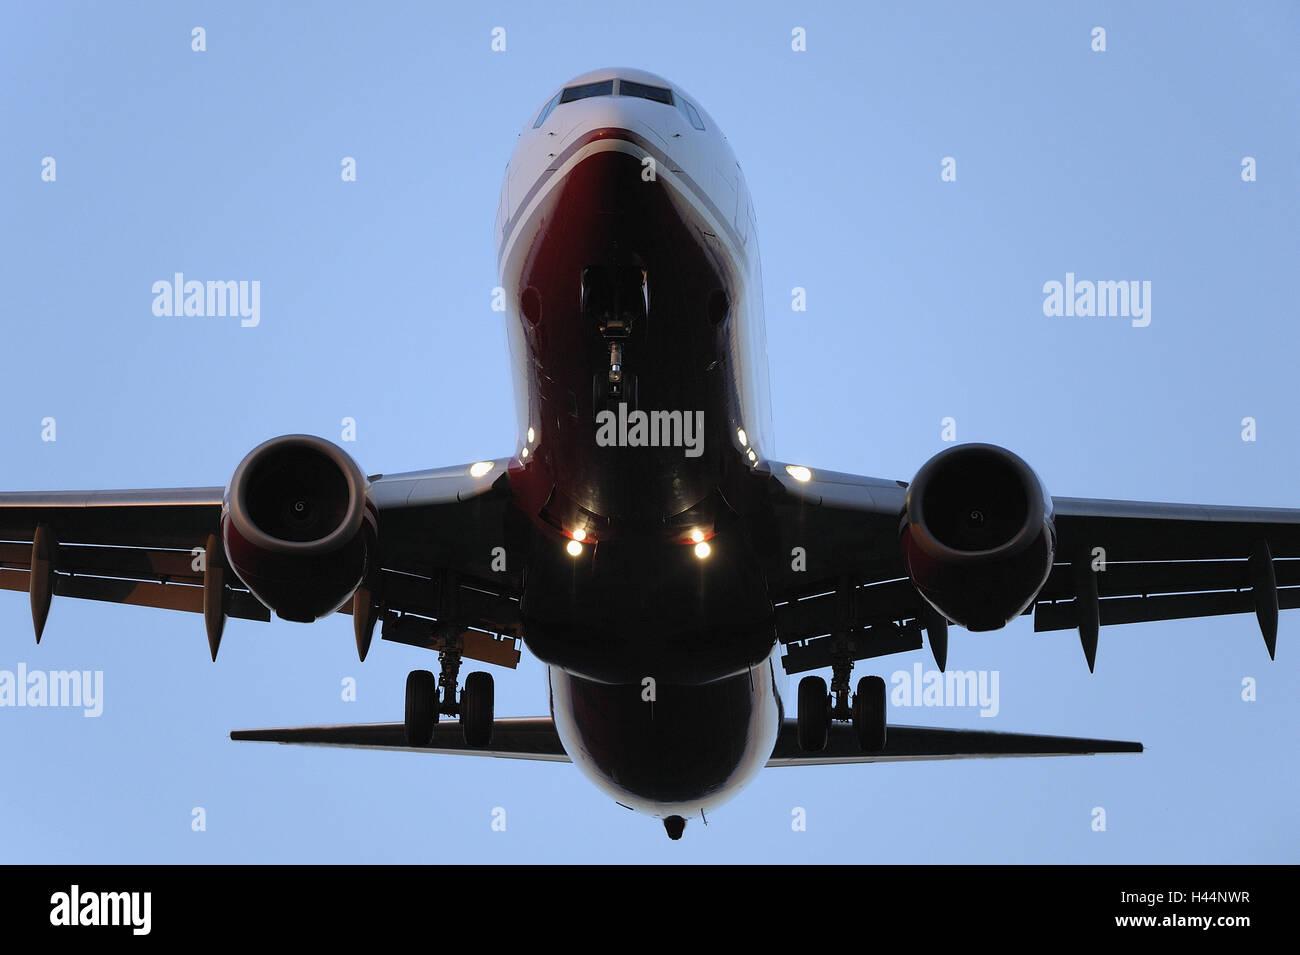 Flugzeug, Himmel, wolkenlos, Stockbild